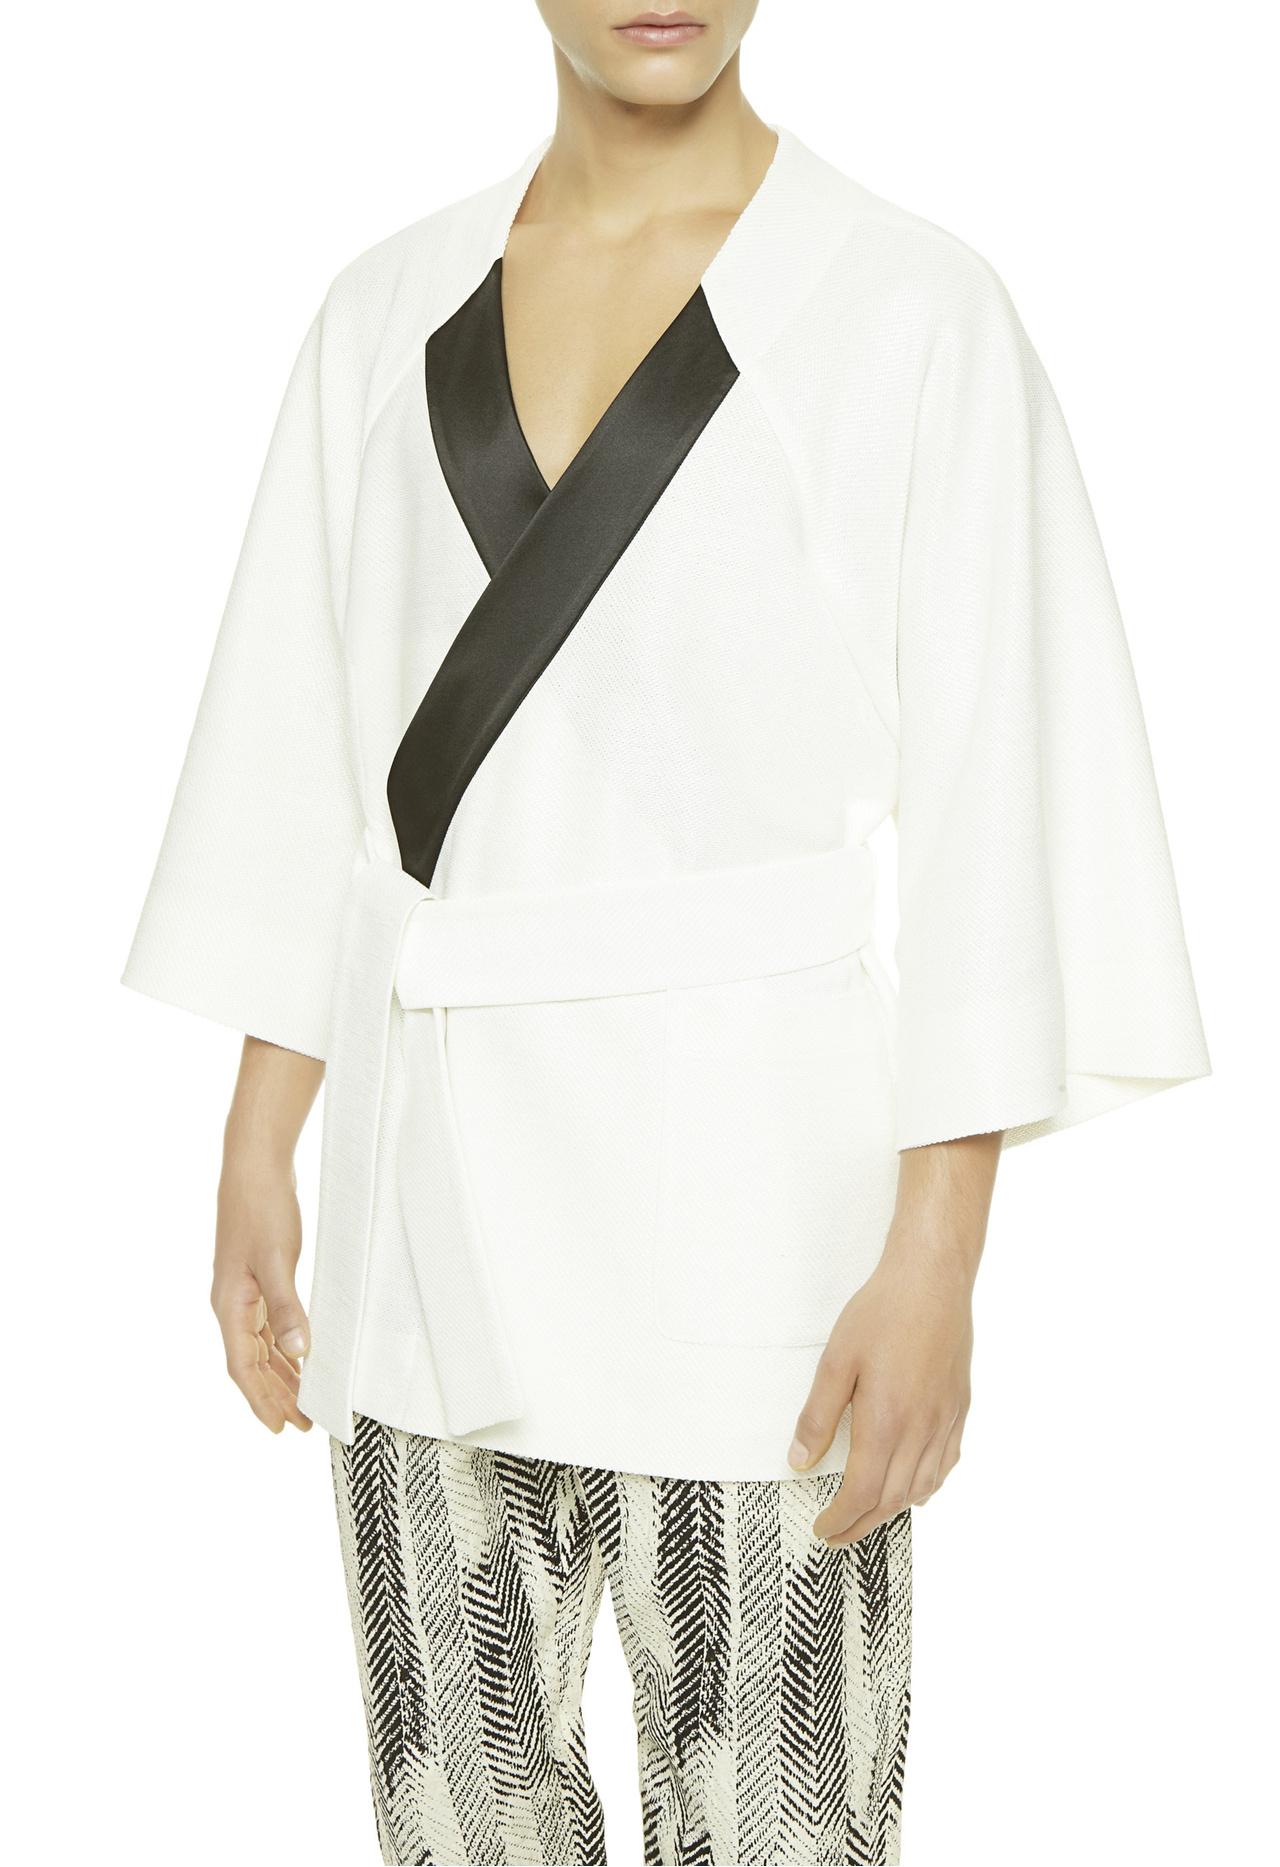 La Perla Short Kimono Night Robe In Natural For Men Lyst